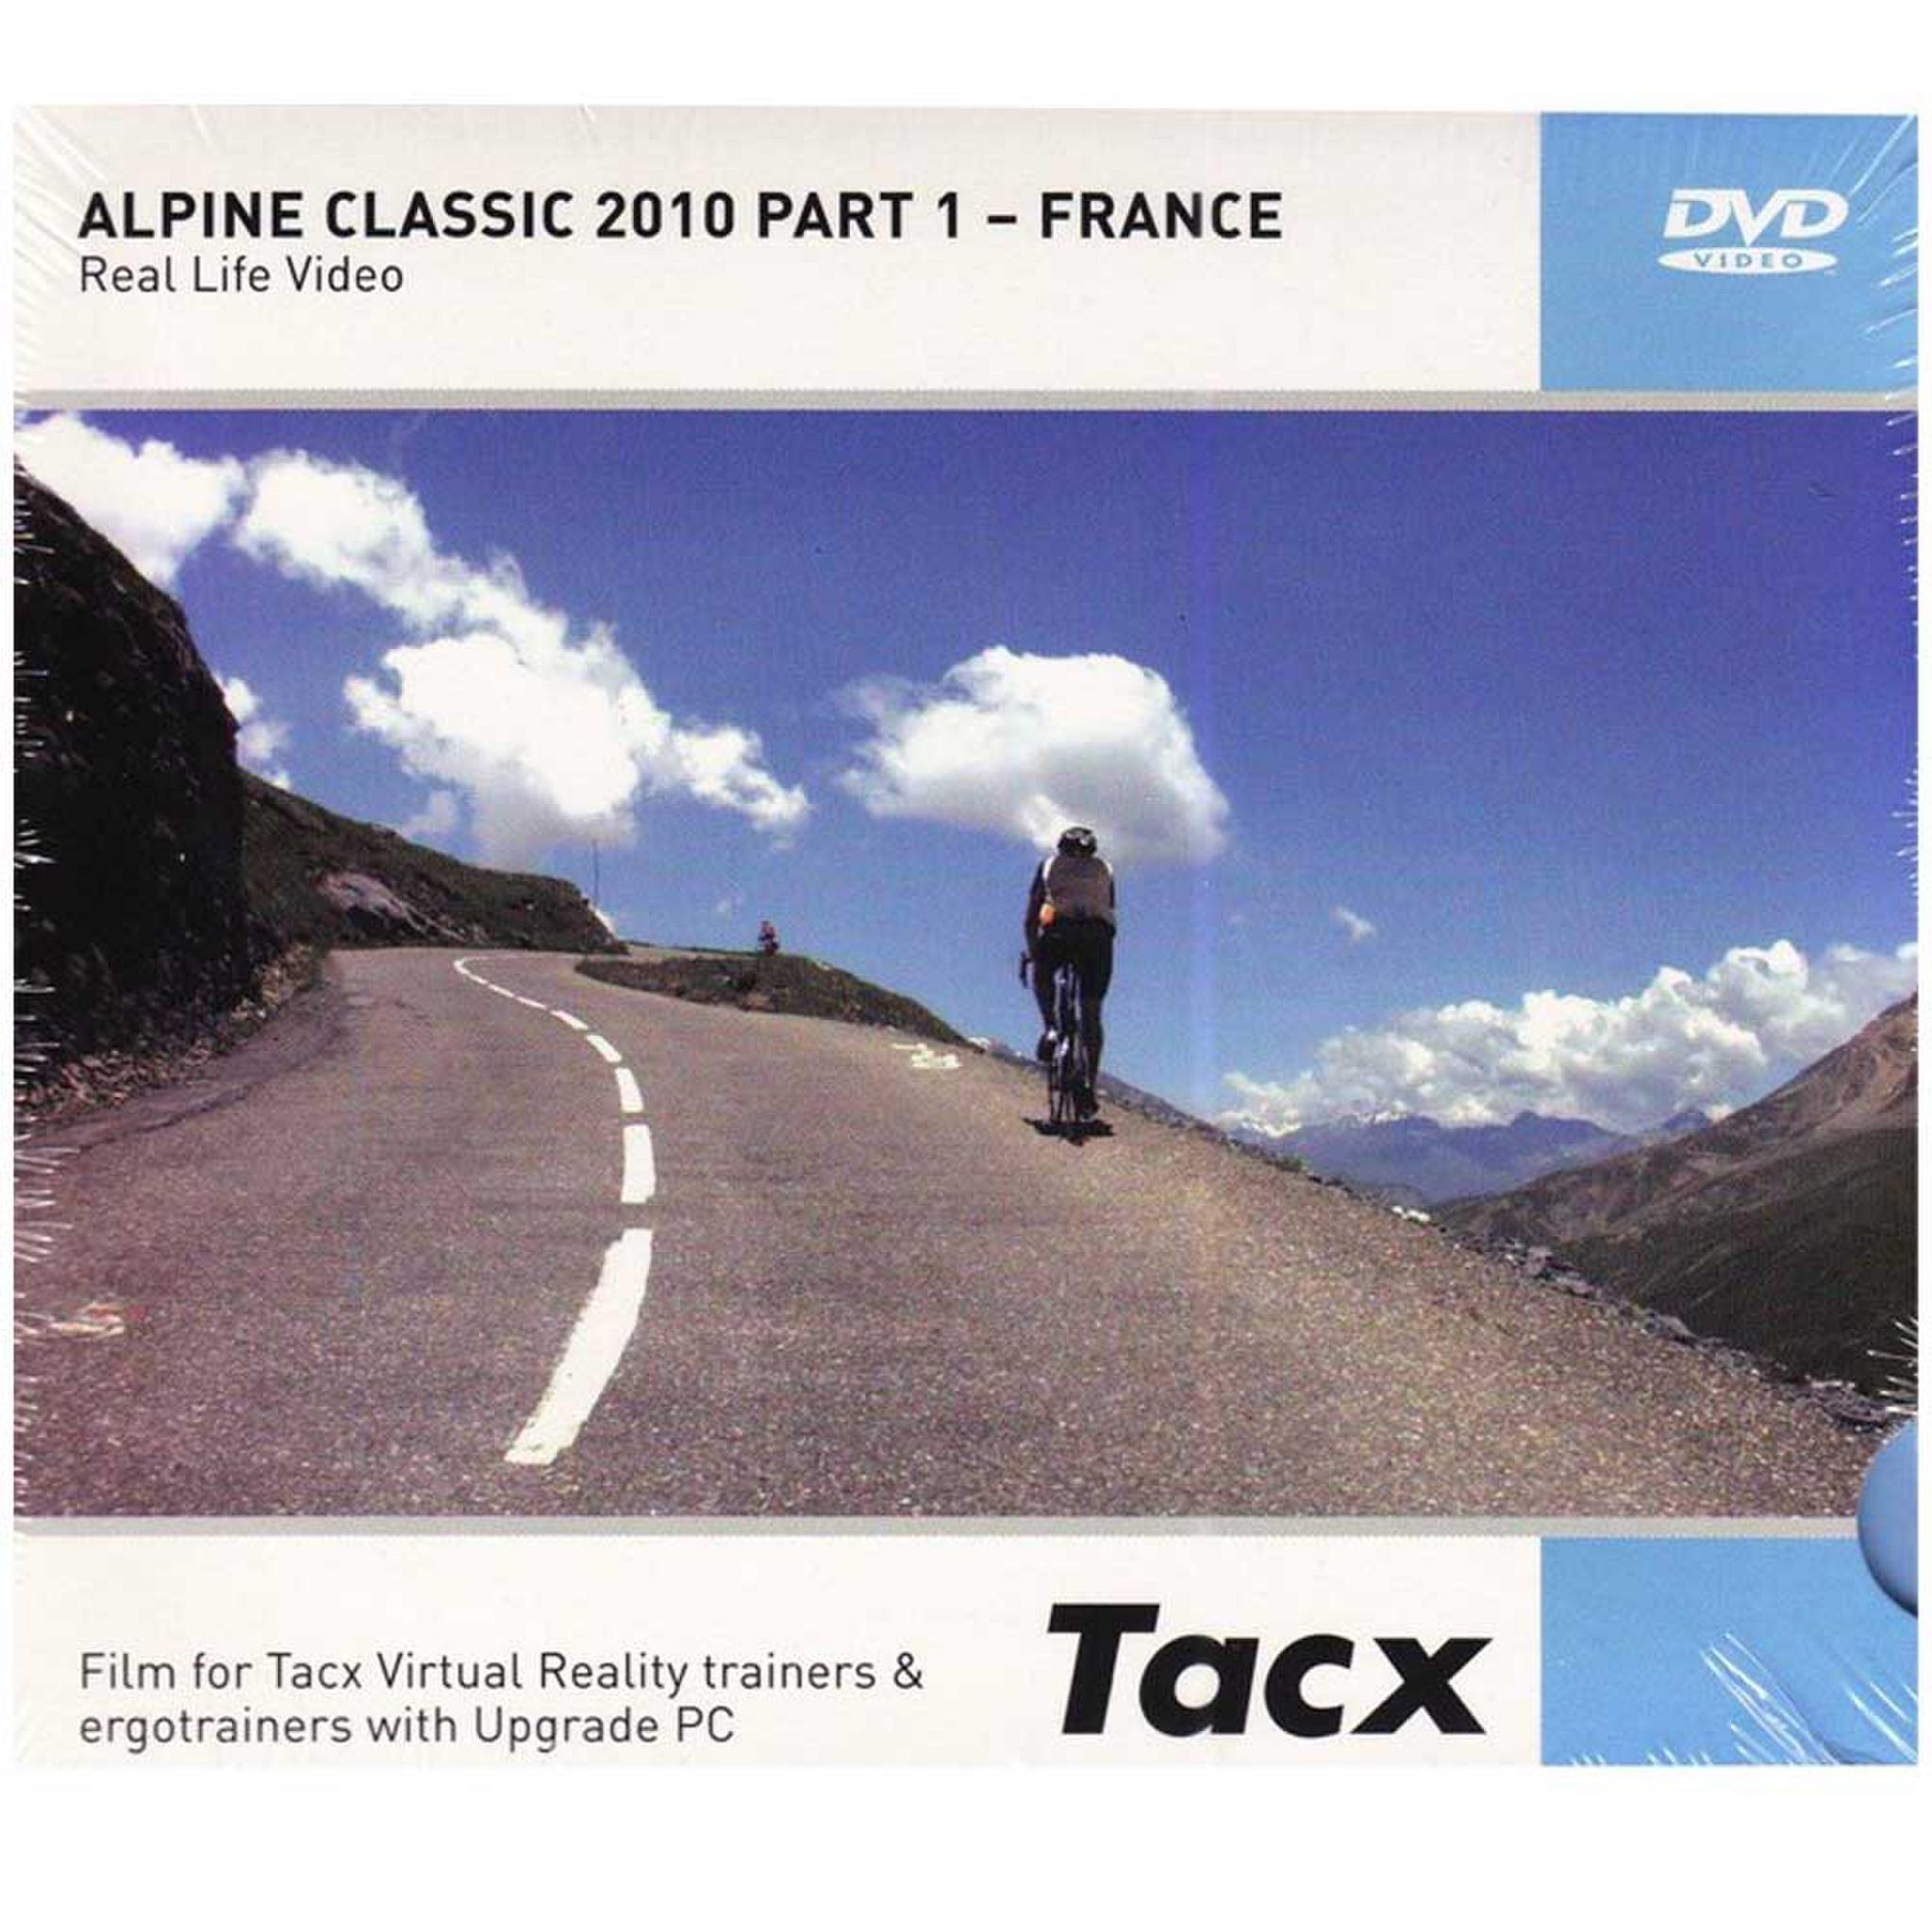 Tacx DVD Alpine Classics Part One